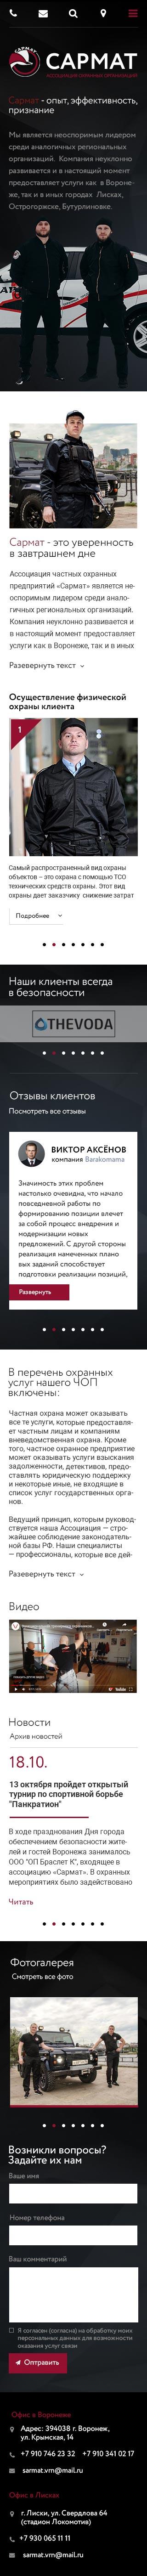 Ассоциация охранных предприятий «Сармат» 320 px